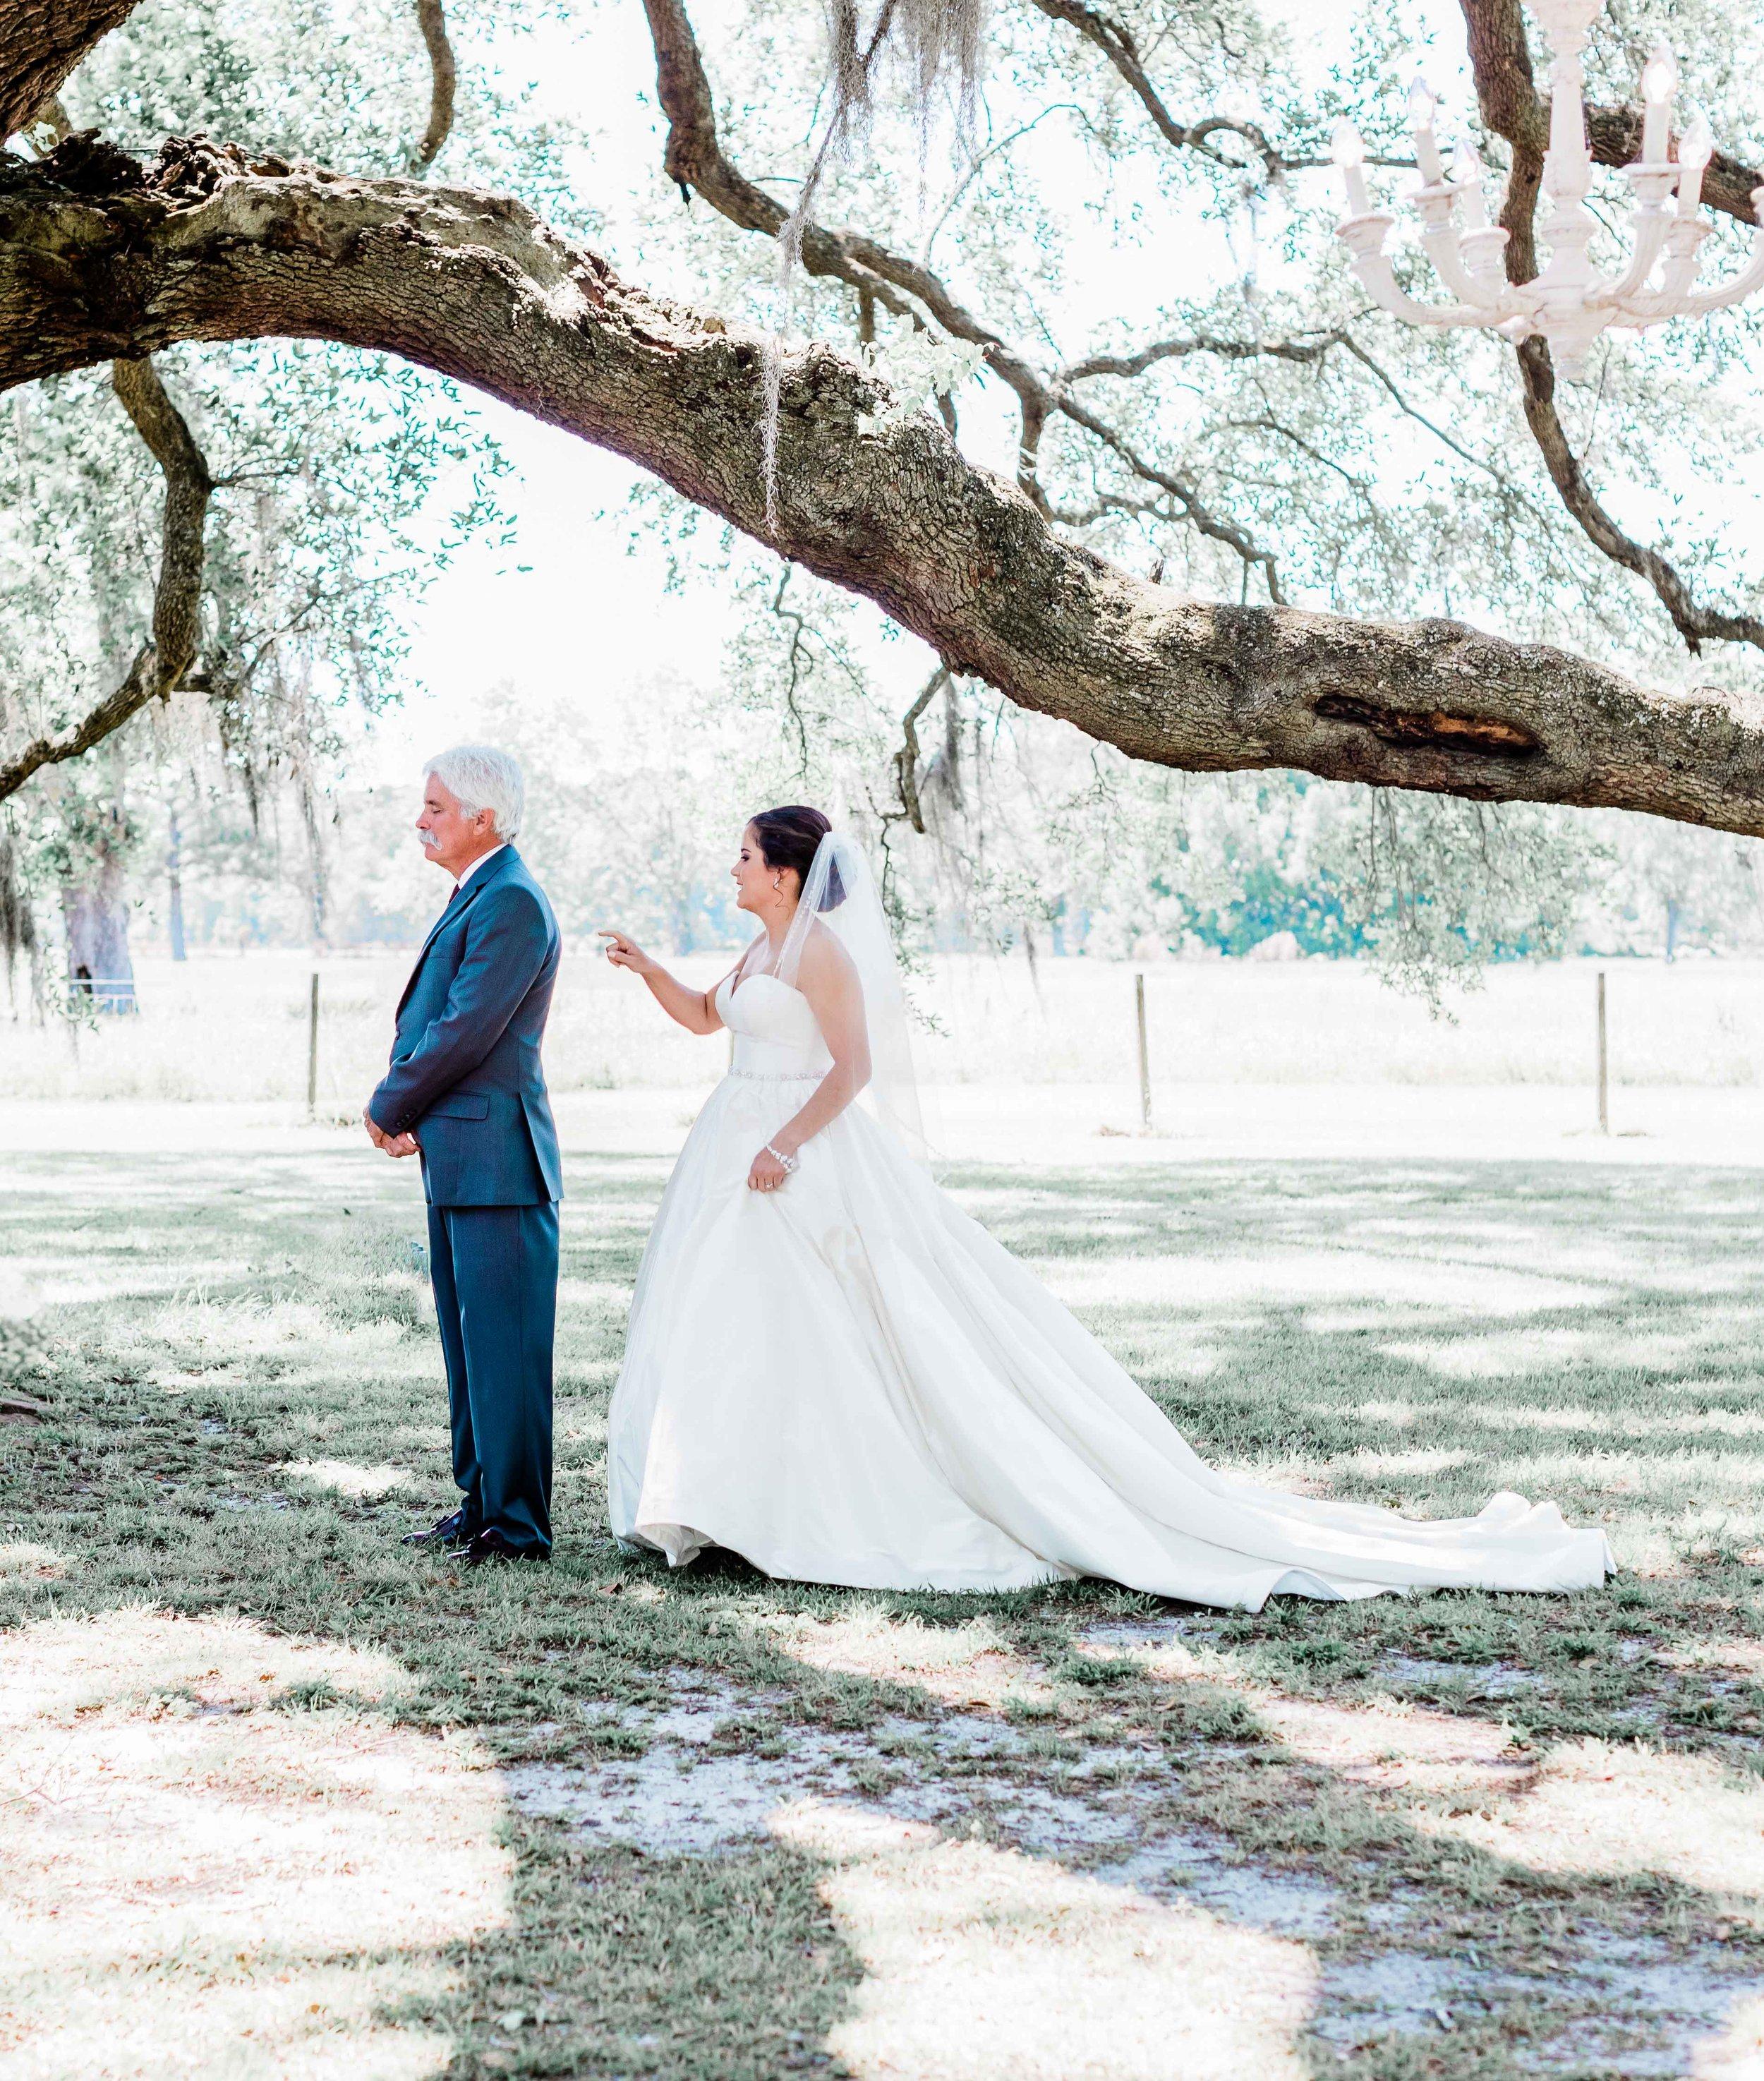 20190427-Southern Lens Photography- Savannah Wedding Photographer-Screven and Caroline-201926.jpg